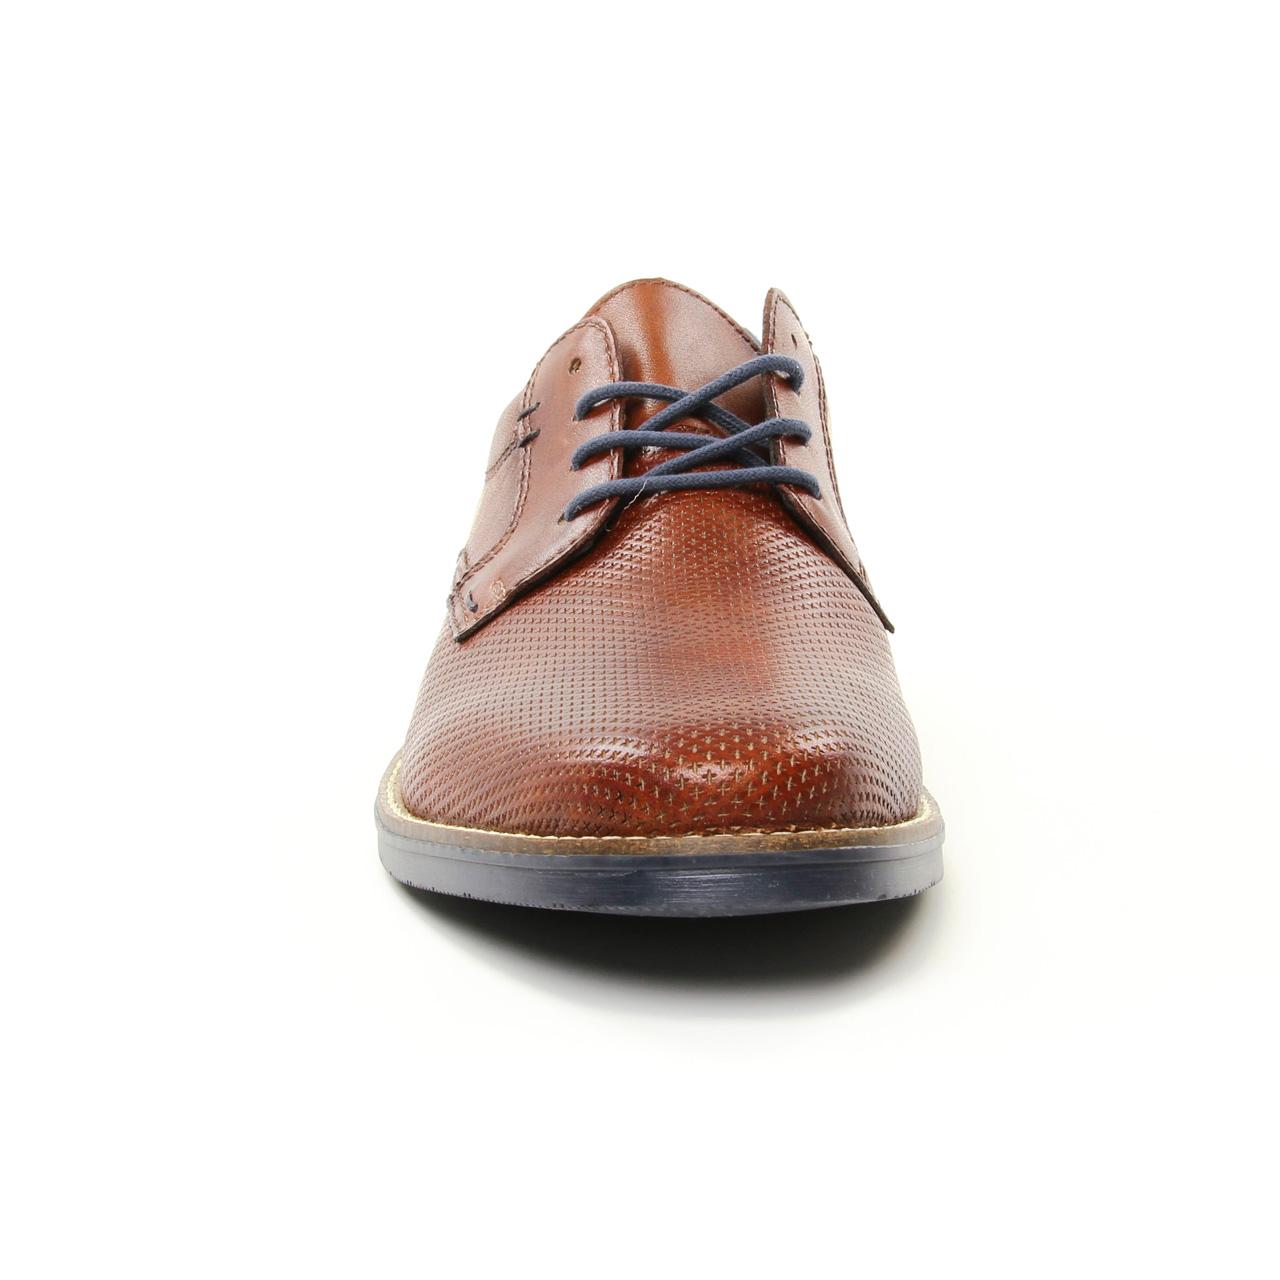 Chaussure basse Homme Rieker 13511 24